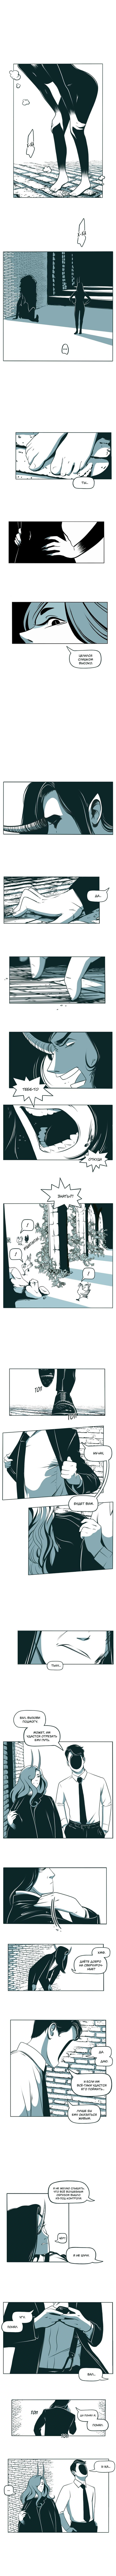 https://r1.ninemanga.com/comics/pic2/0/33536/420922/1534437760201.jpg Page 5